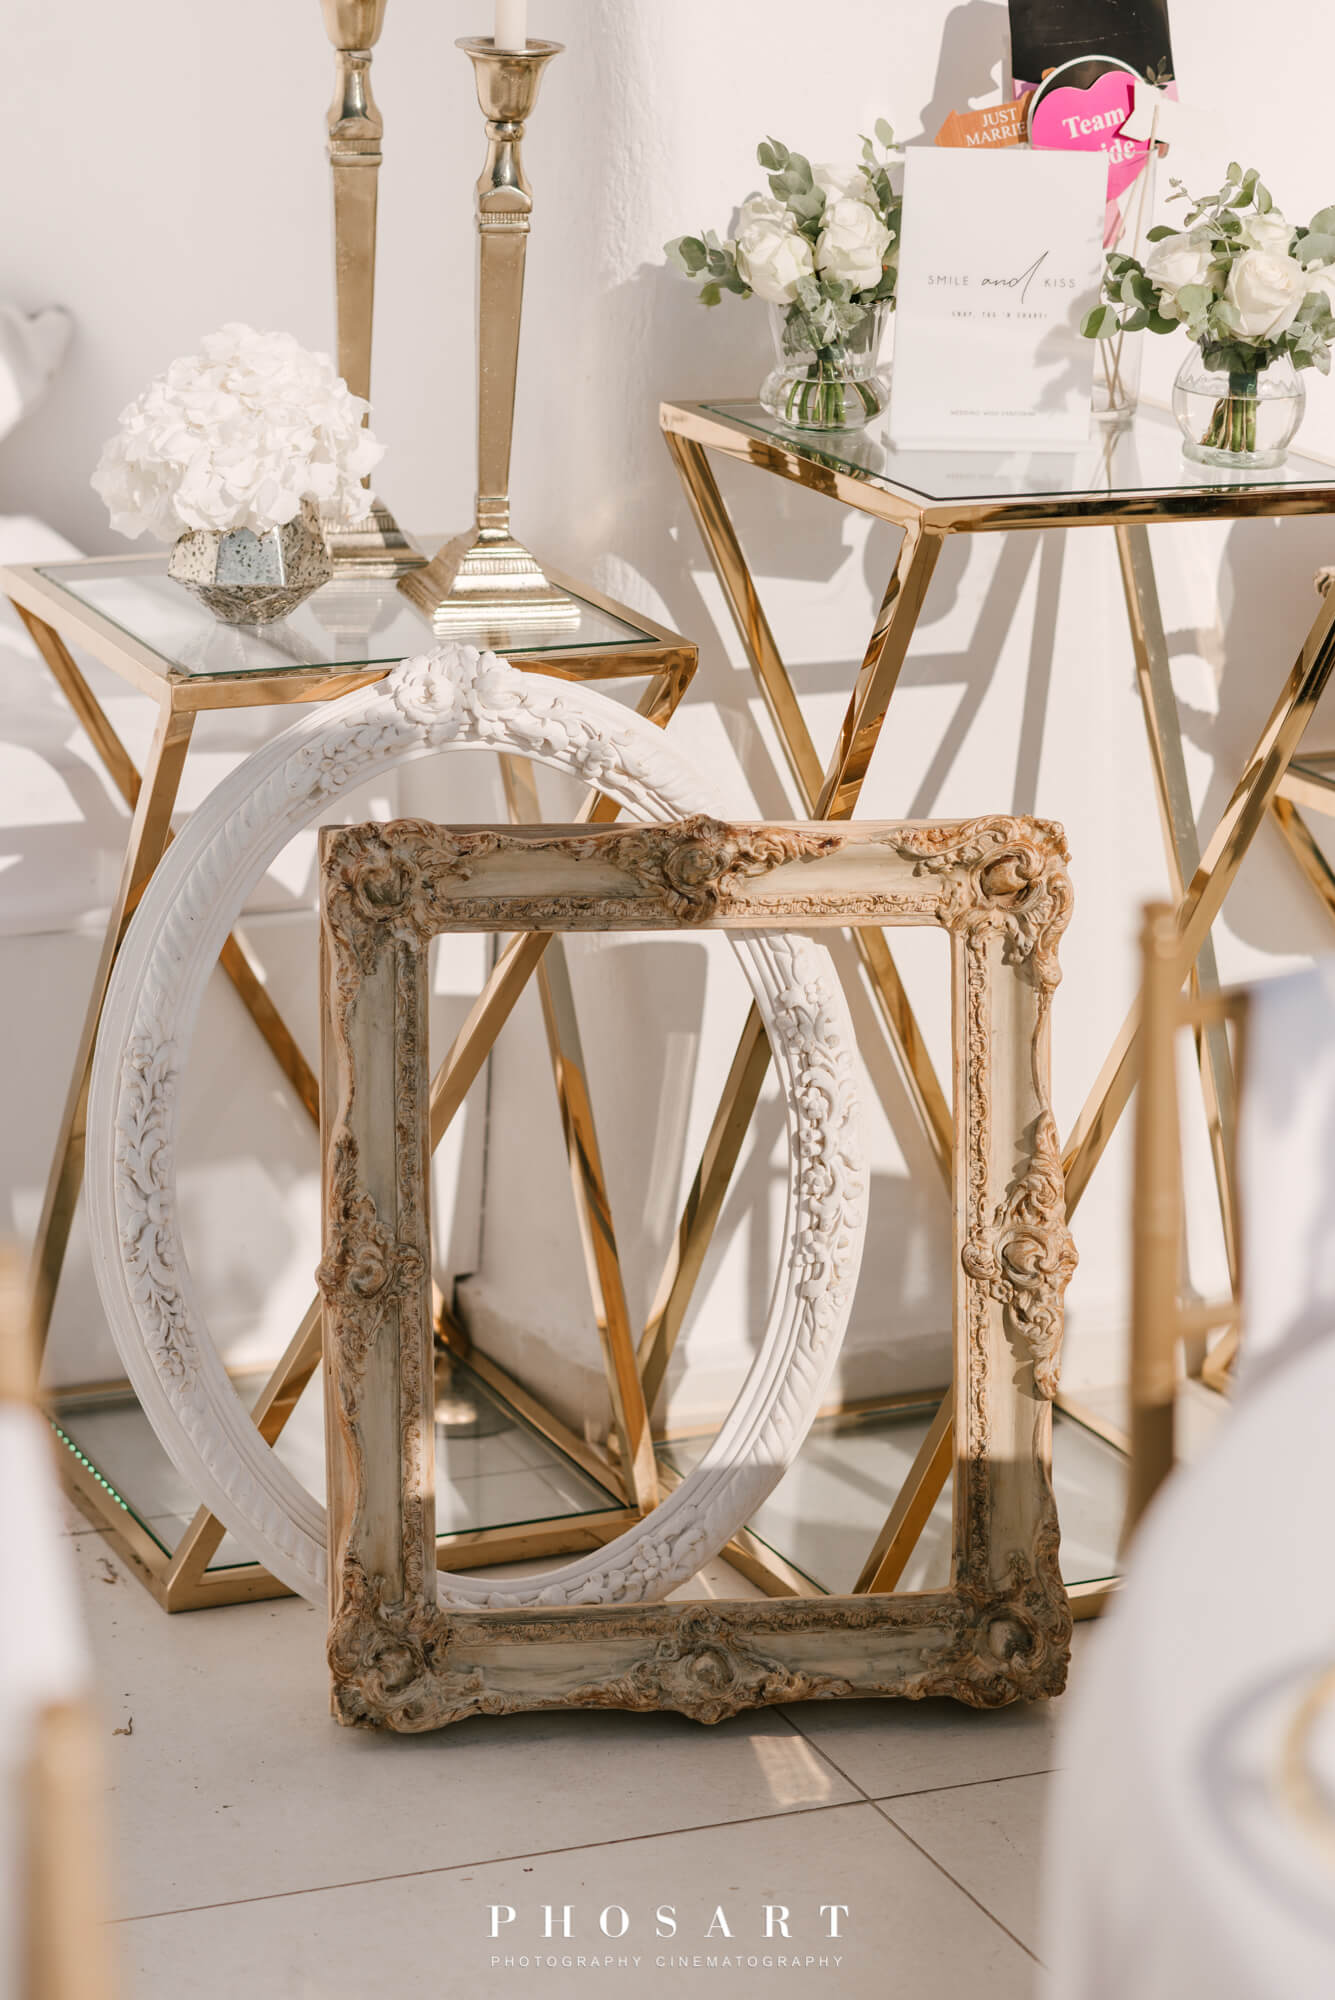 Santorini Wedding Venues - The Bridal Consultant